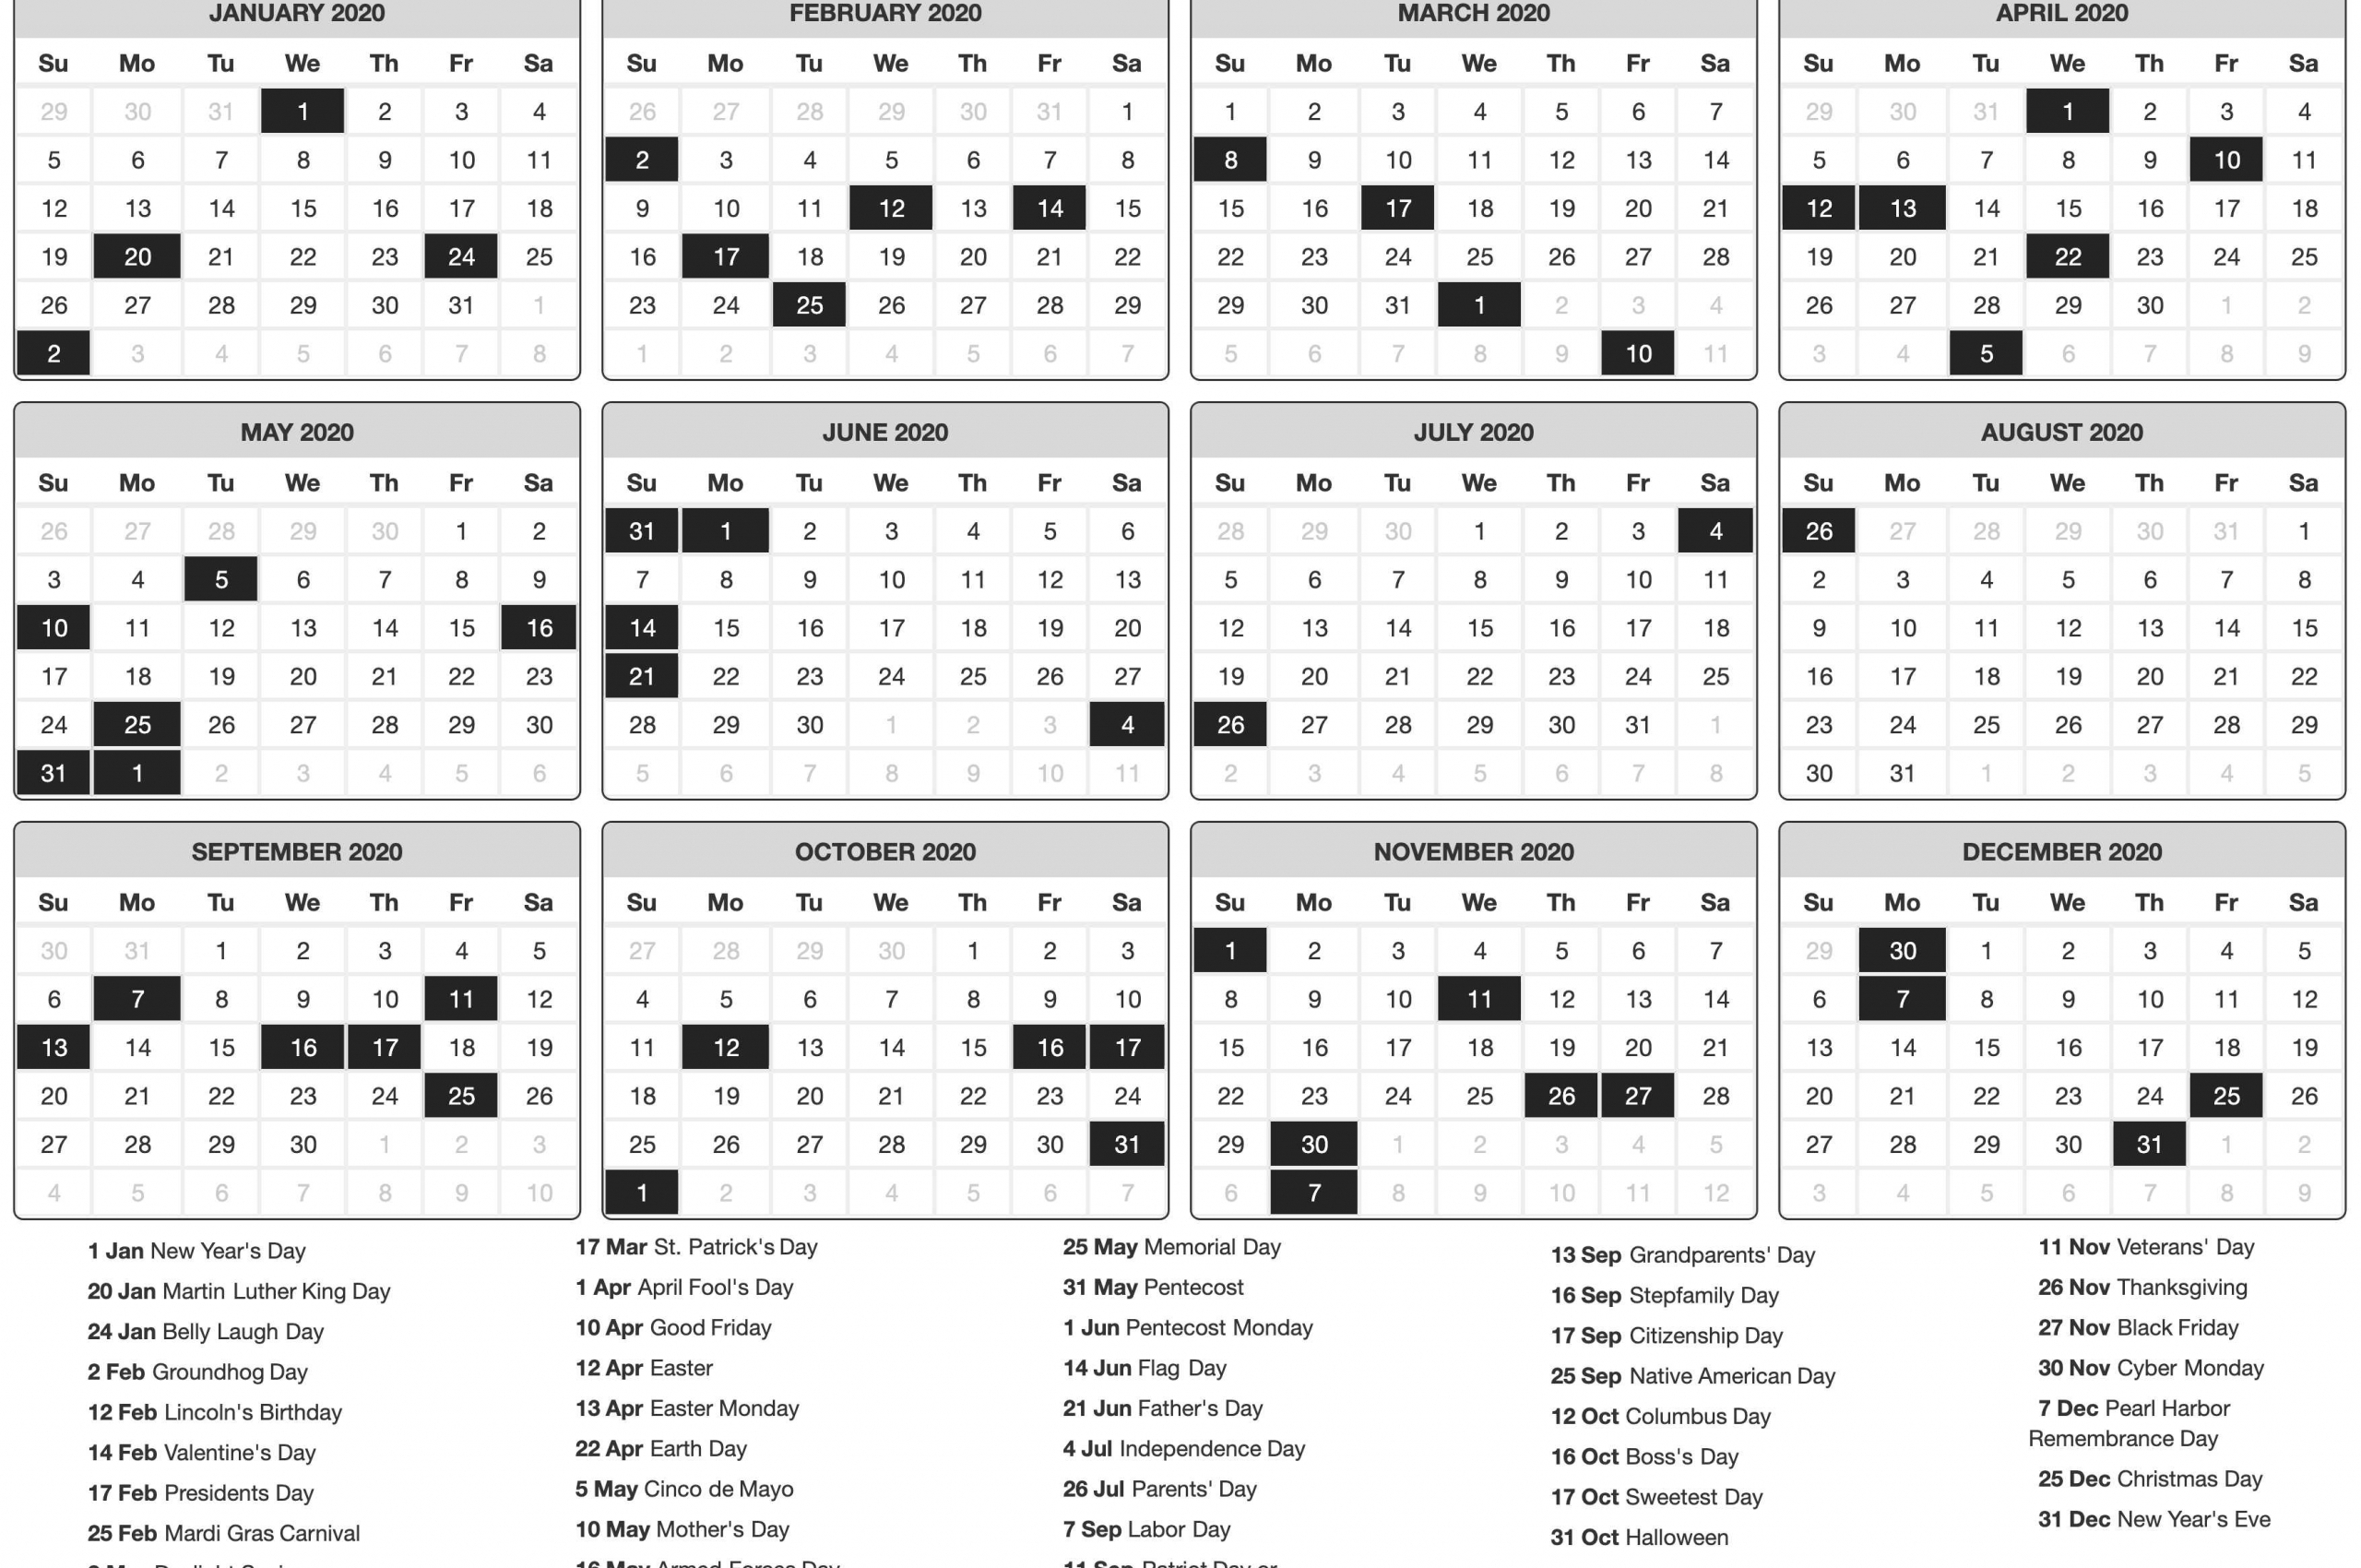 Free Download 2020 Printable Calendar Posters Images